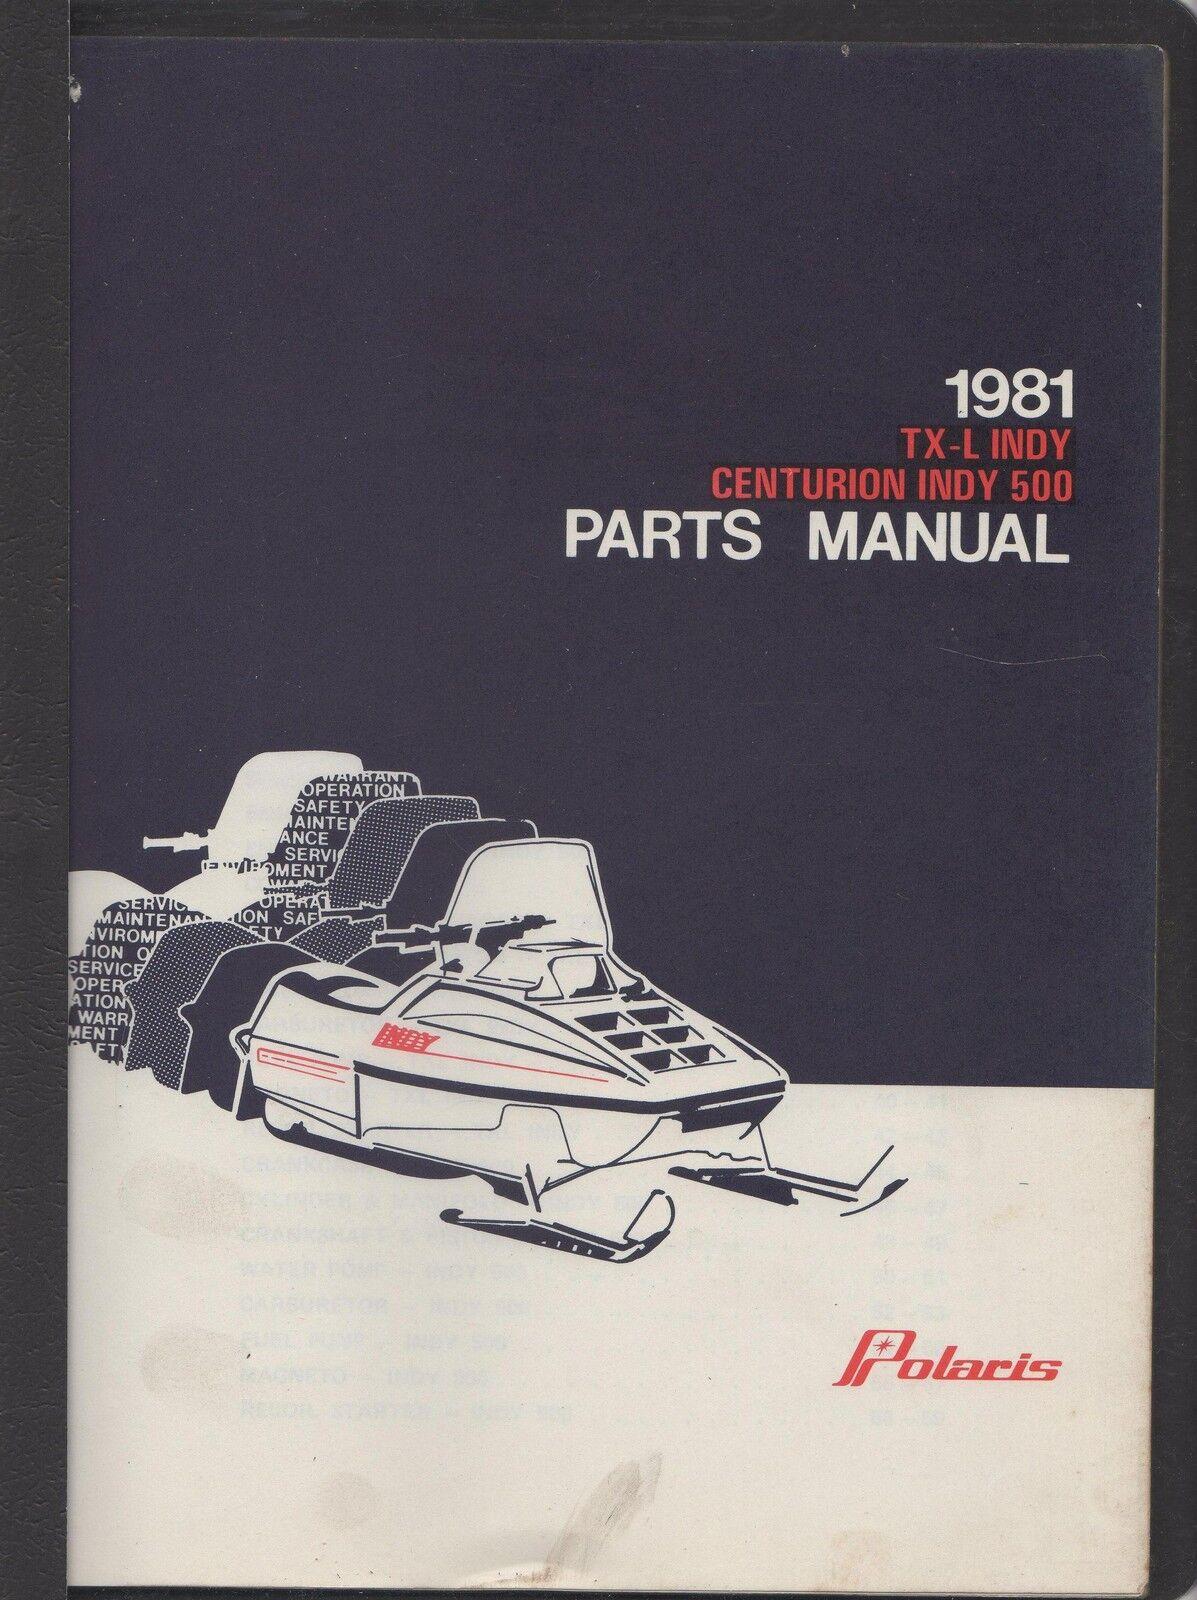 1981 POLARIS SNOWMOBILE TX-L INDY, CENTURION INDY 500 PARTS MANUAL